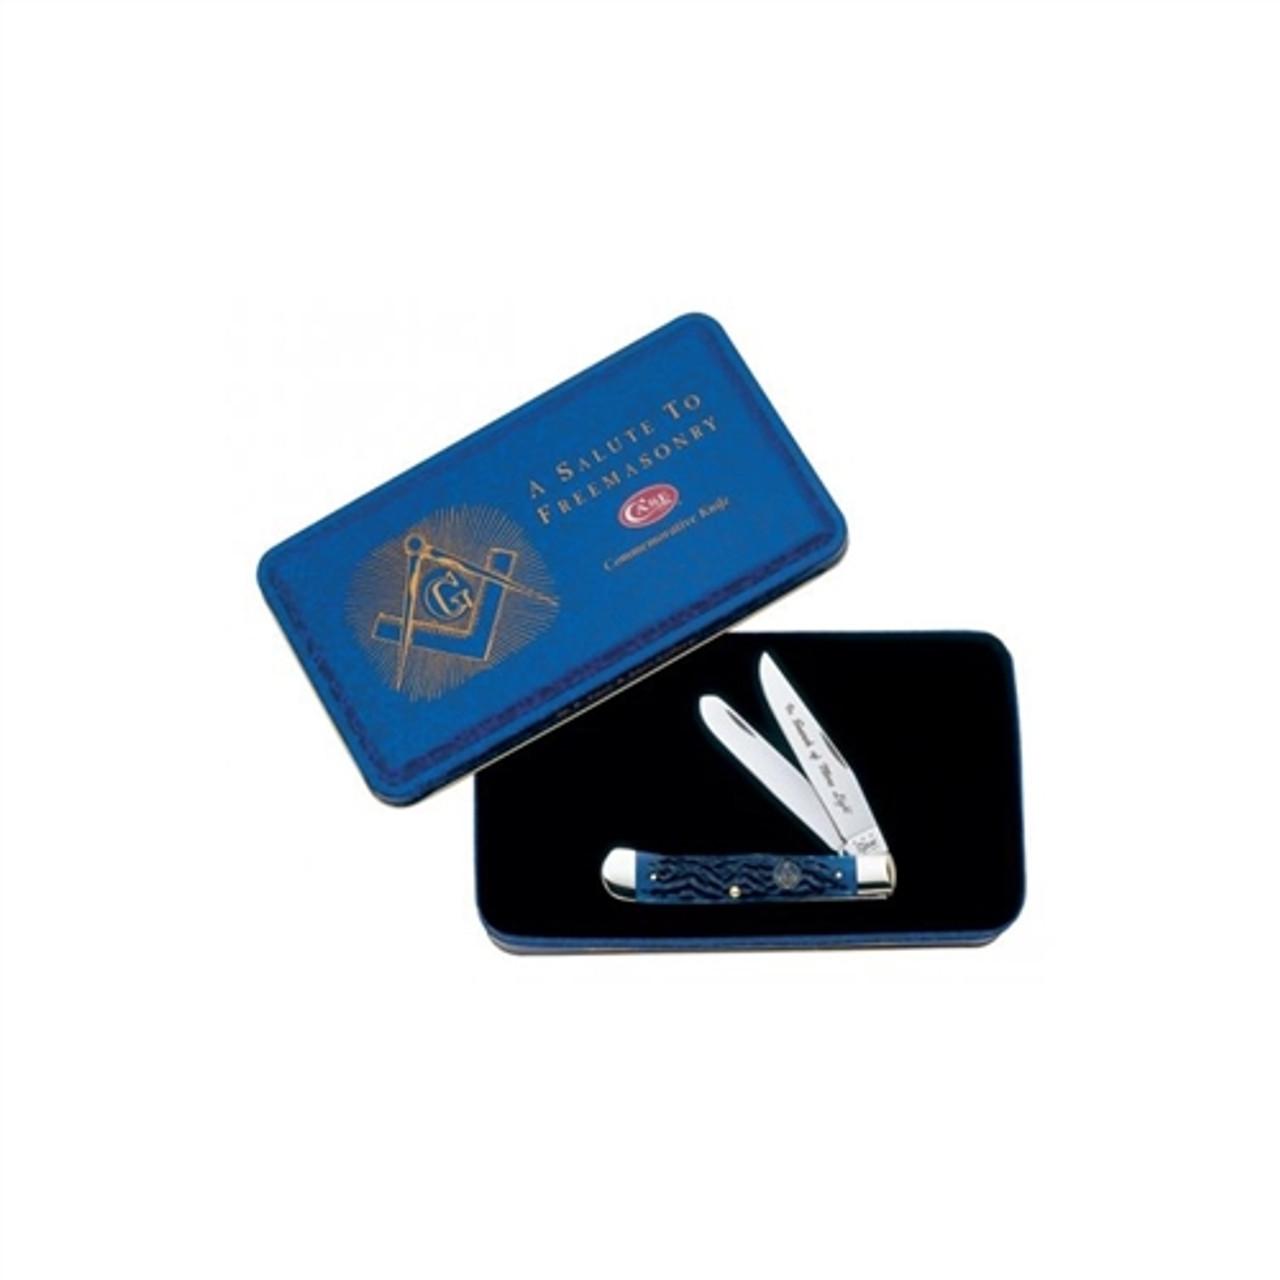 Case Freemasonry Commemorative Trapper Knife, Blue